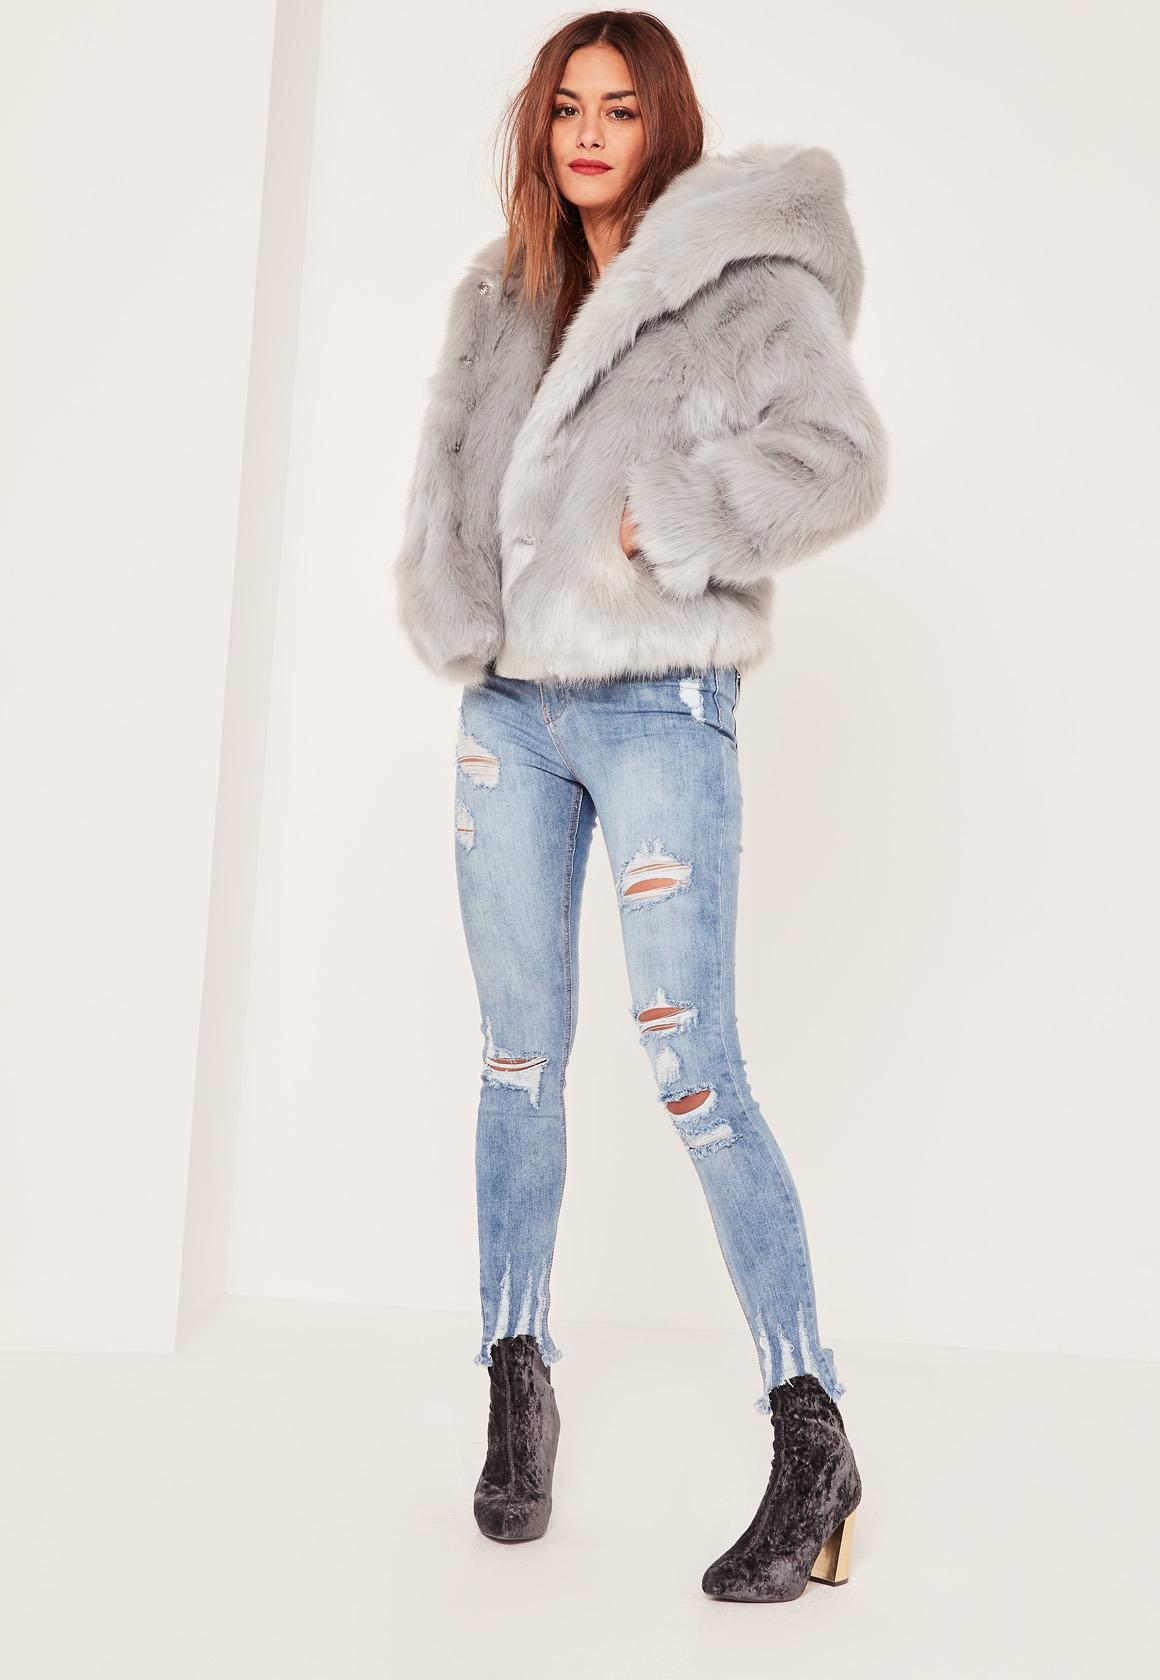 aab69f23f8 Missguided Caroline Receveur Grey Hooded Faux Fur Coat in Gray - Lyst